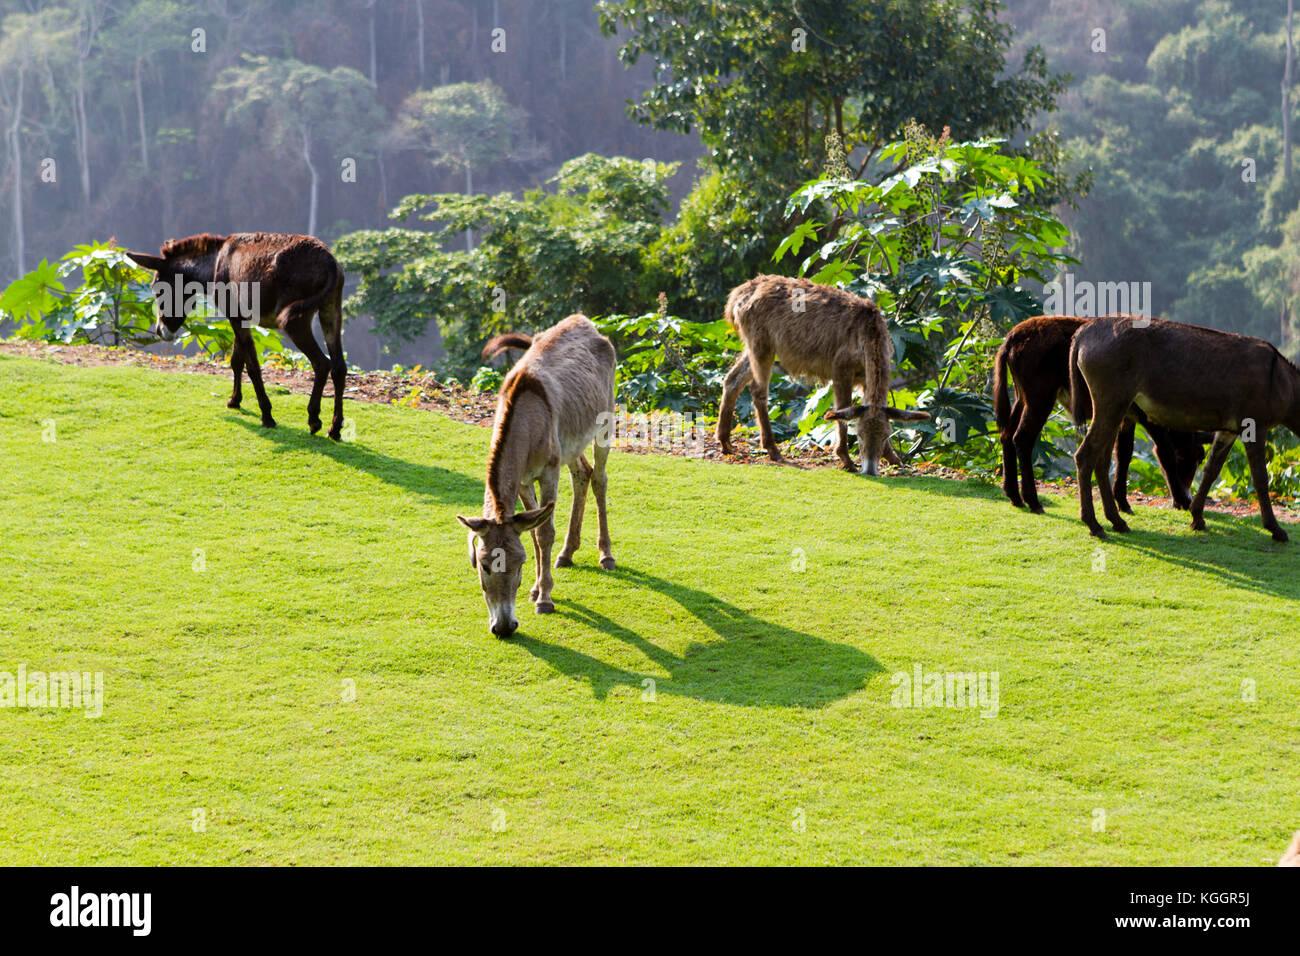 Donkeys grazing - Stock Image